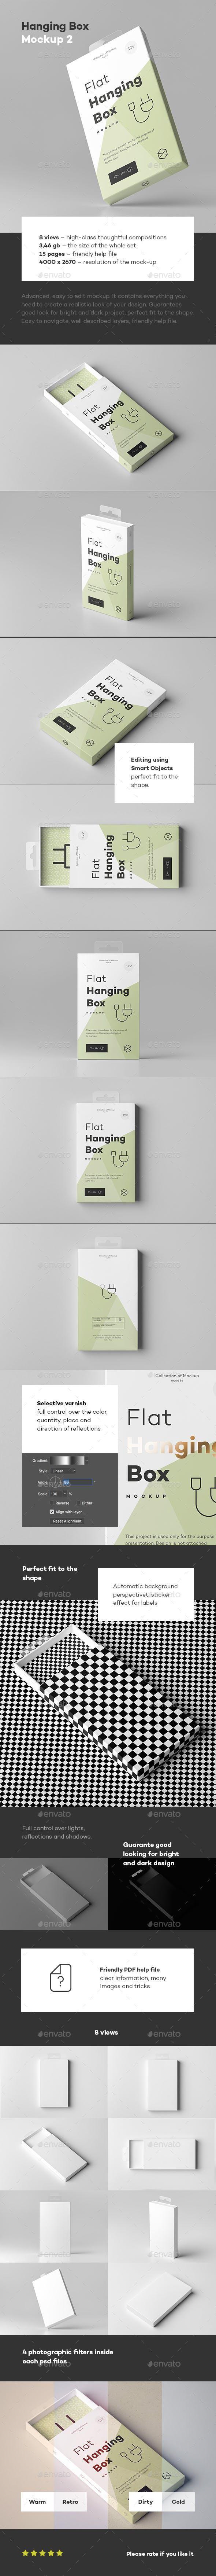 Download Hanging Box Mock Up 2 For 6 Packagingtemplates Psd Templatedesign Mockupdesign Graphic Packagi Graphic Design Templates Template Design Packaging Mockup